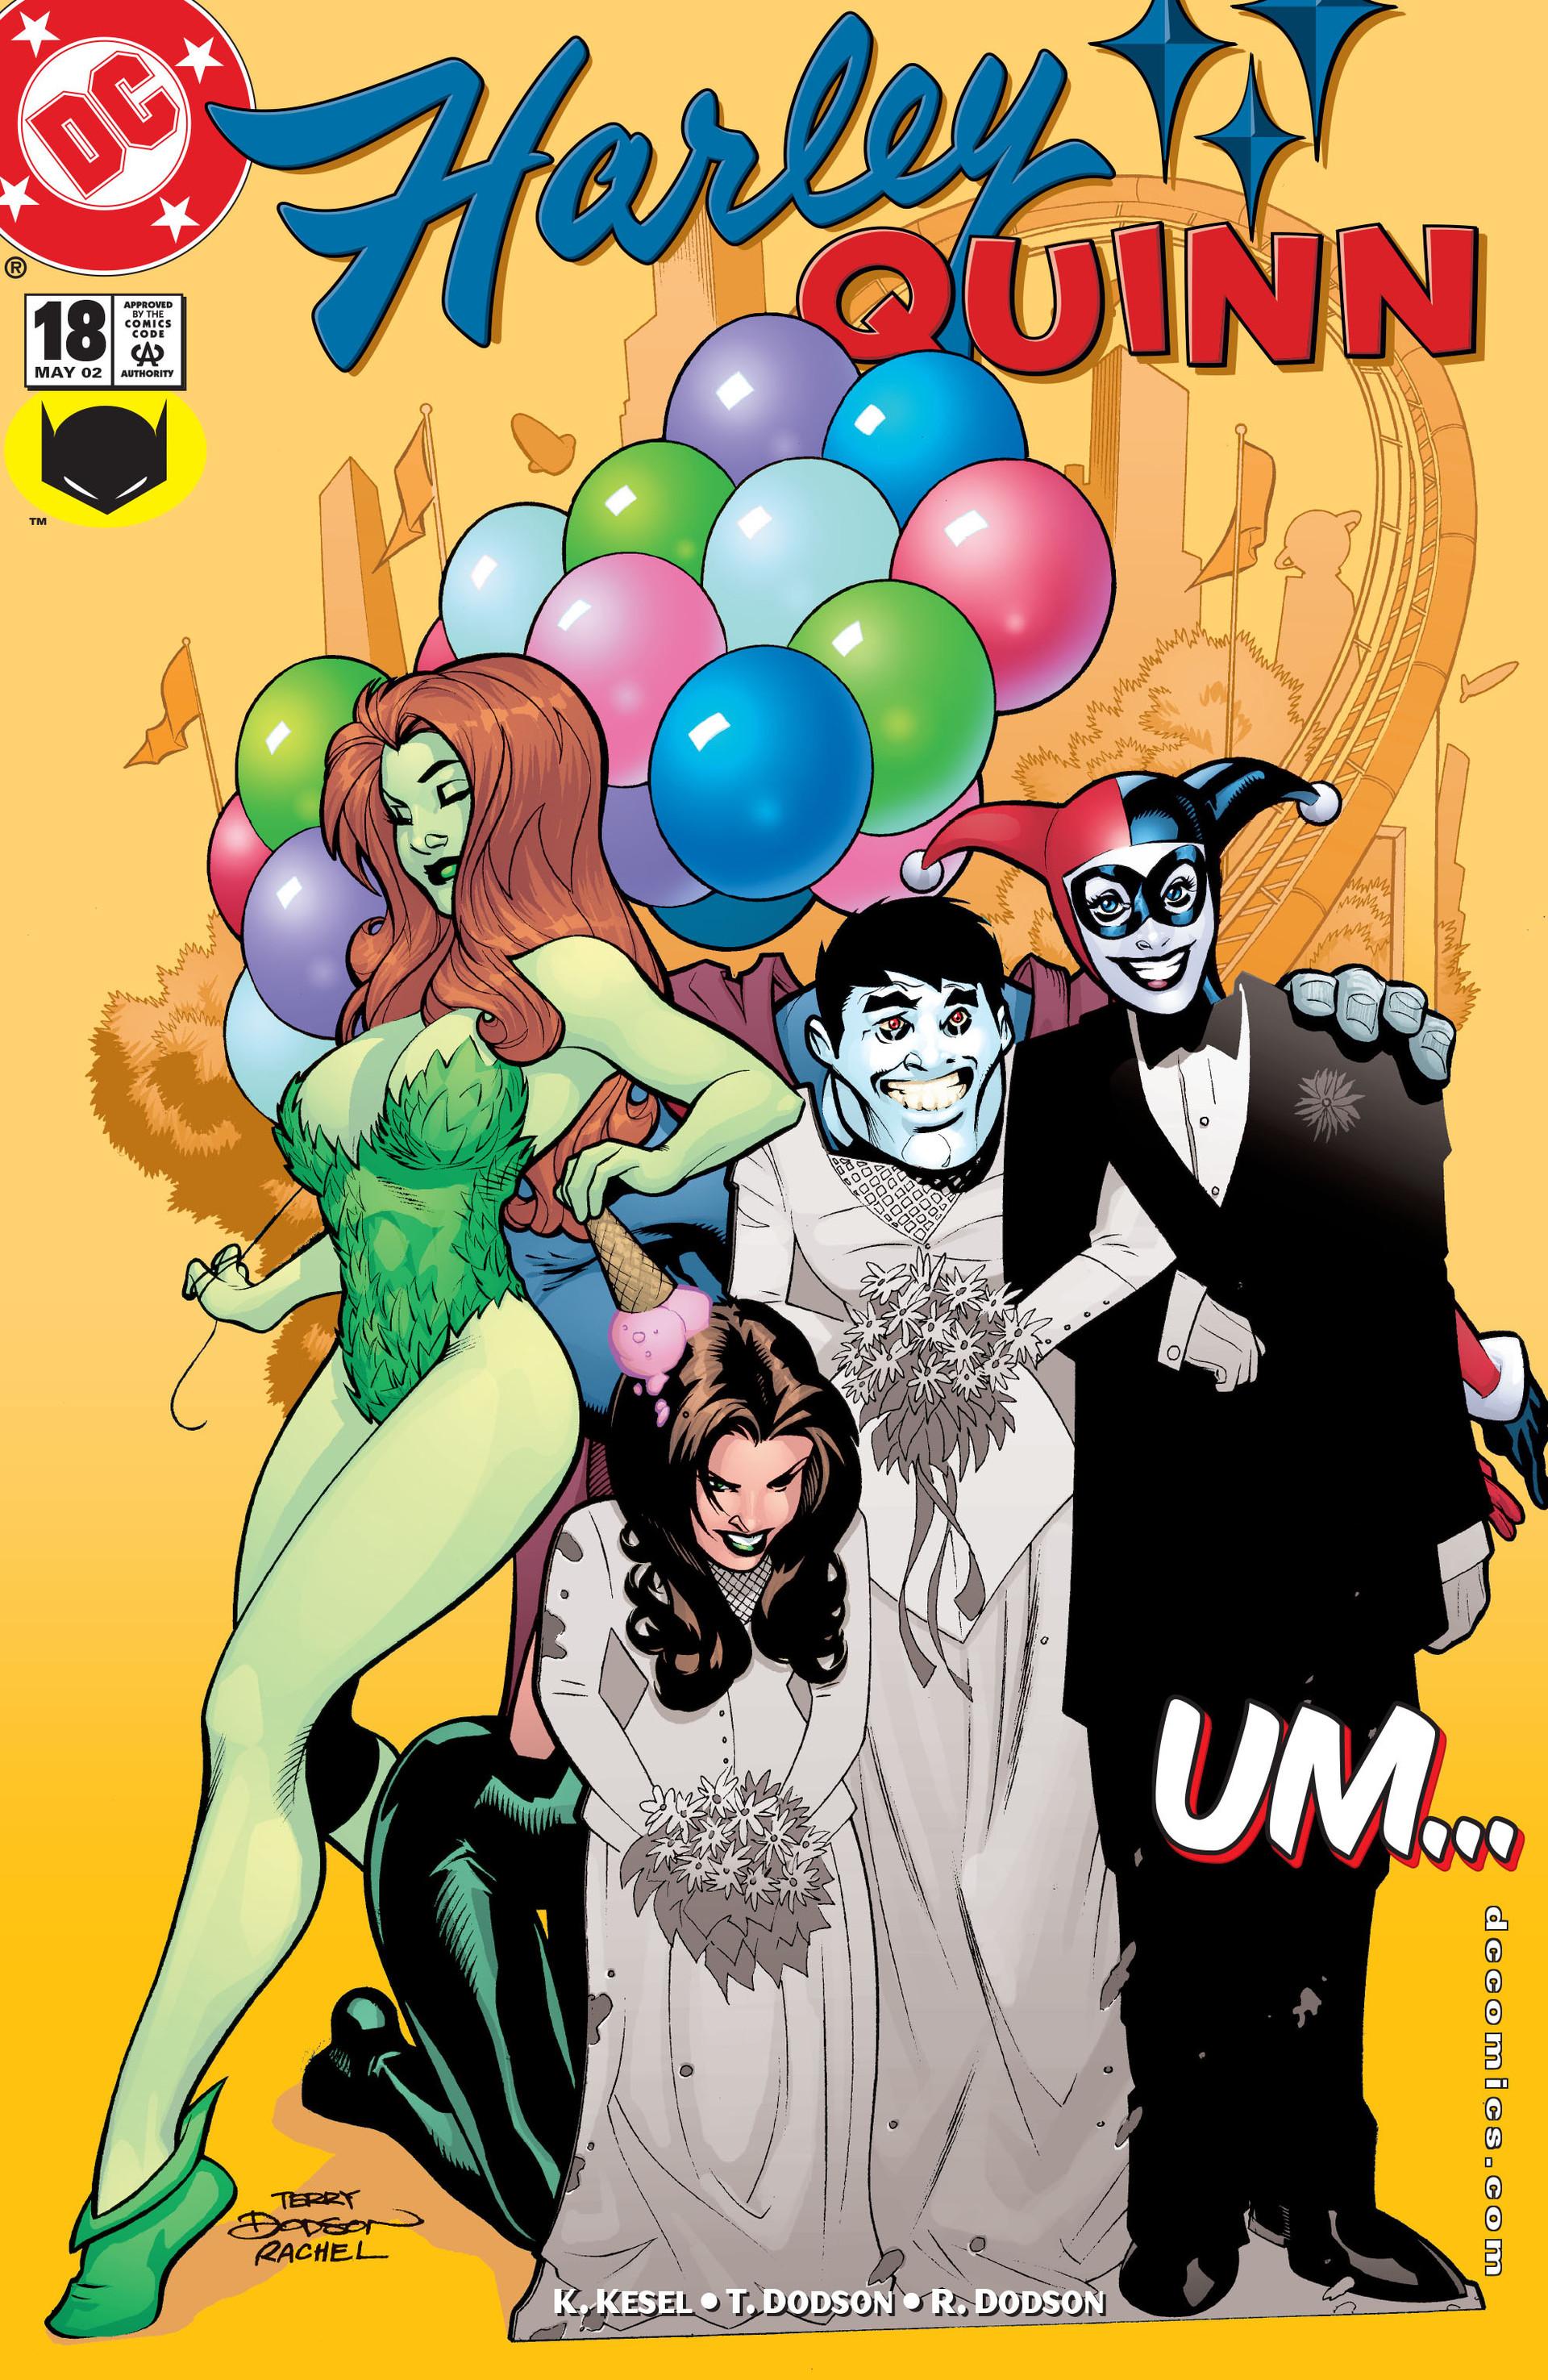 Harley Quinn Vol.1 #18